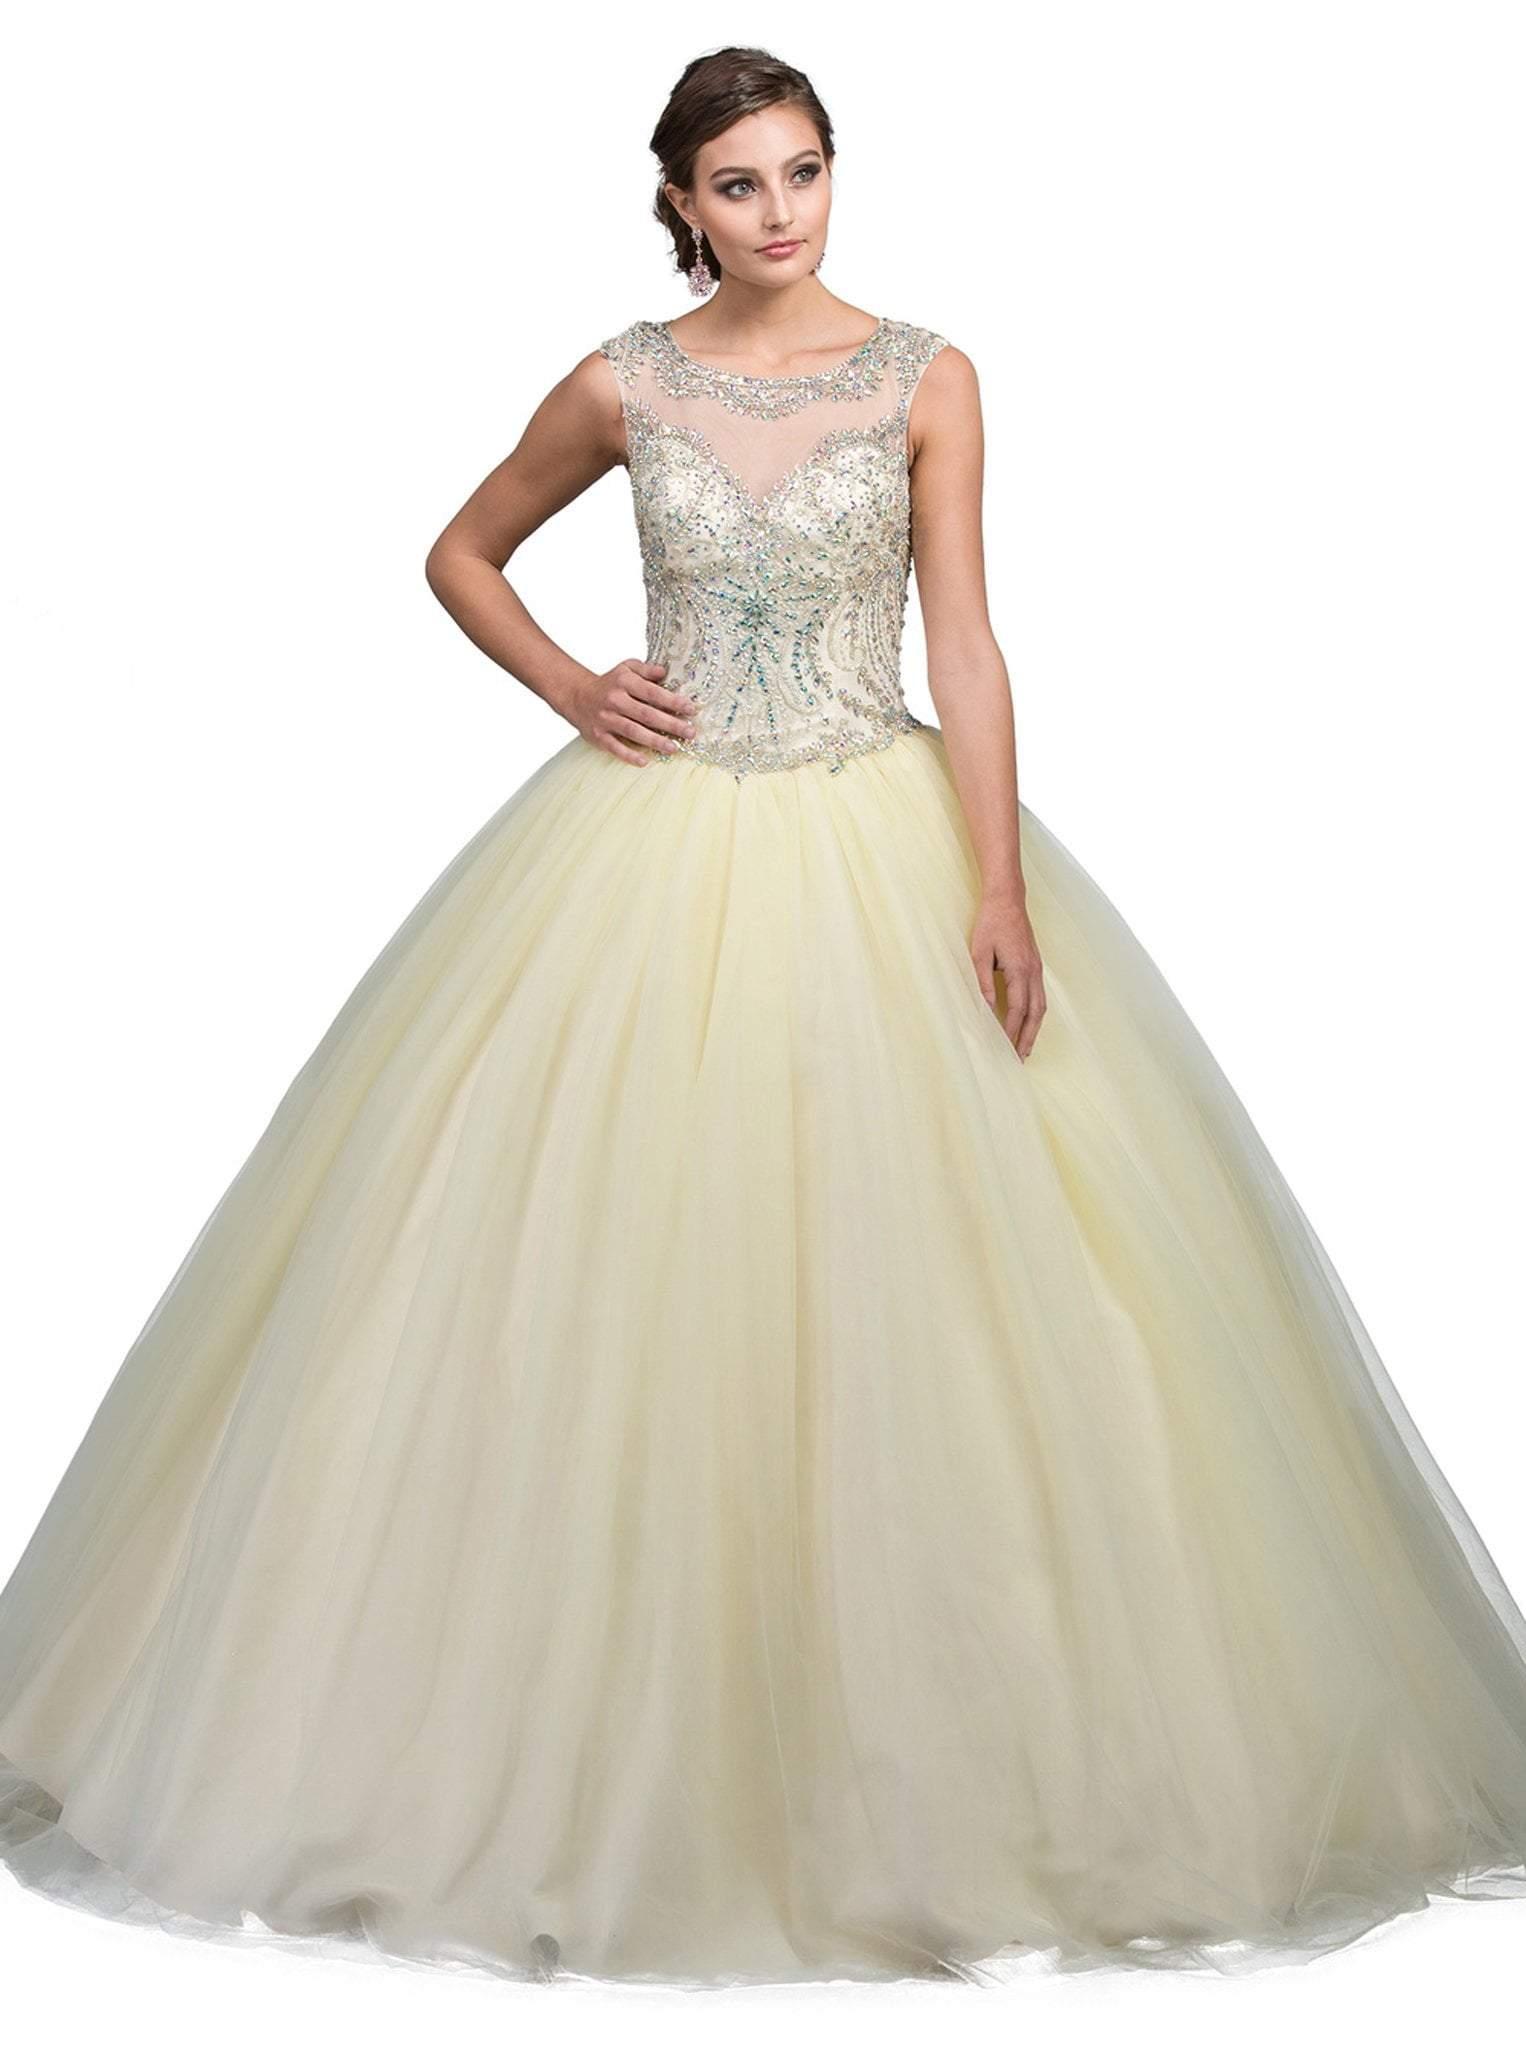 Dancing Queen - 1240 Sleeveless Crystal Beaded Quinceanera Ballgown